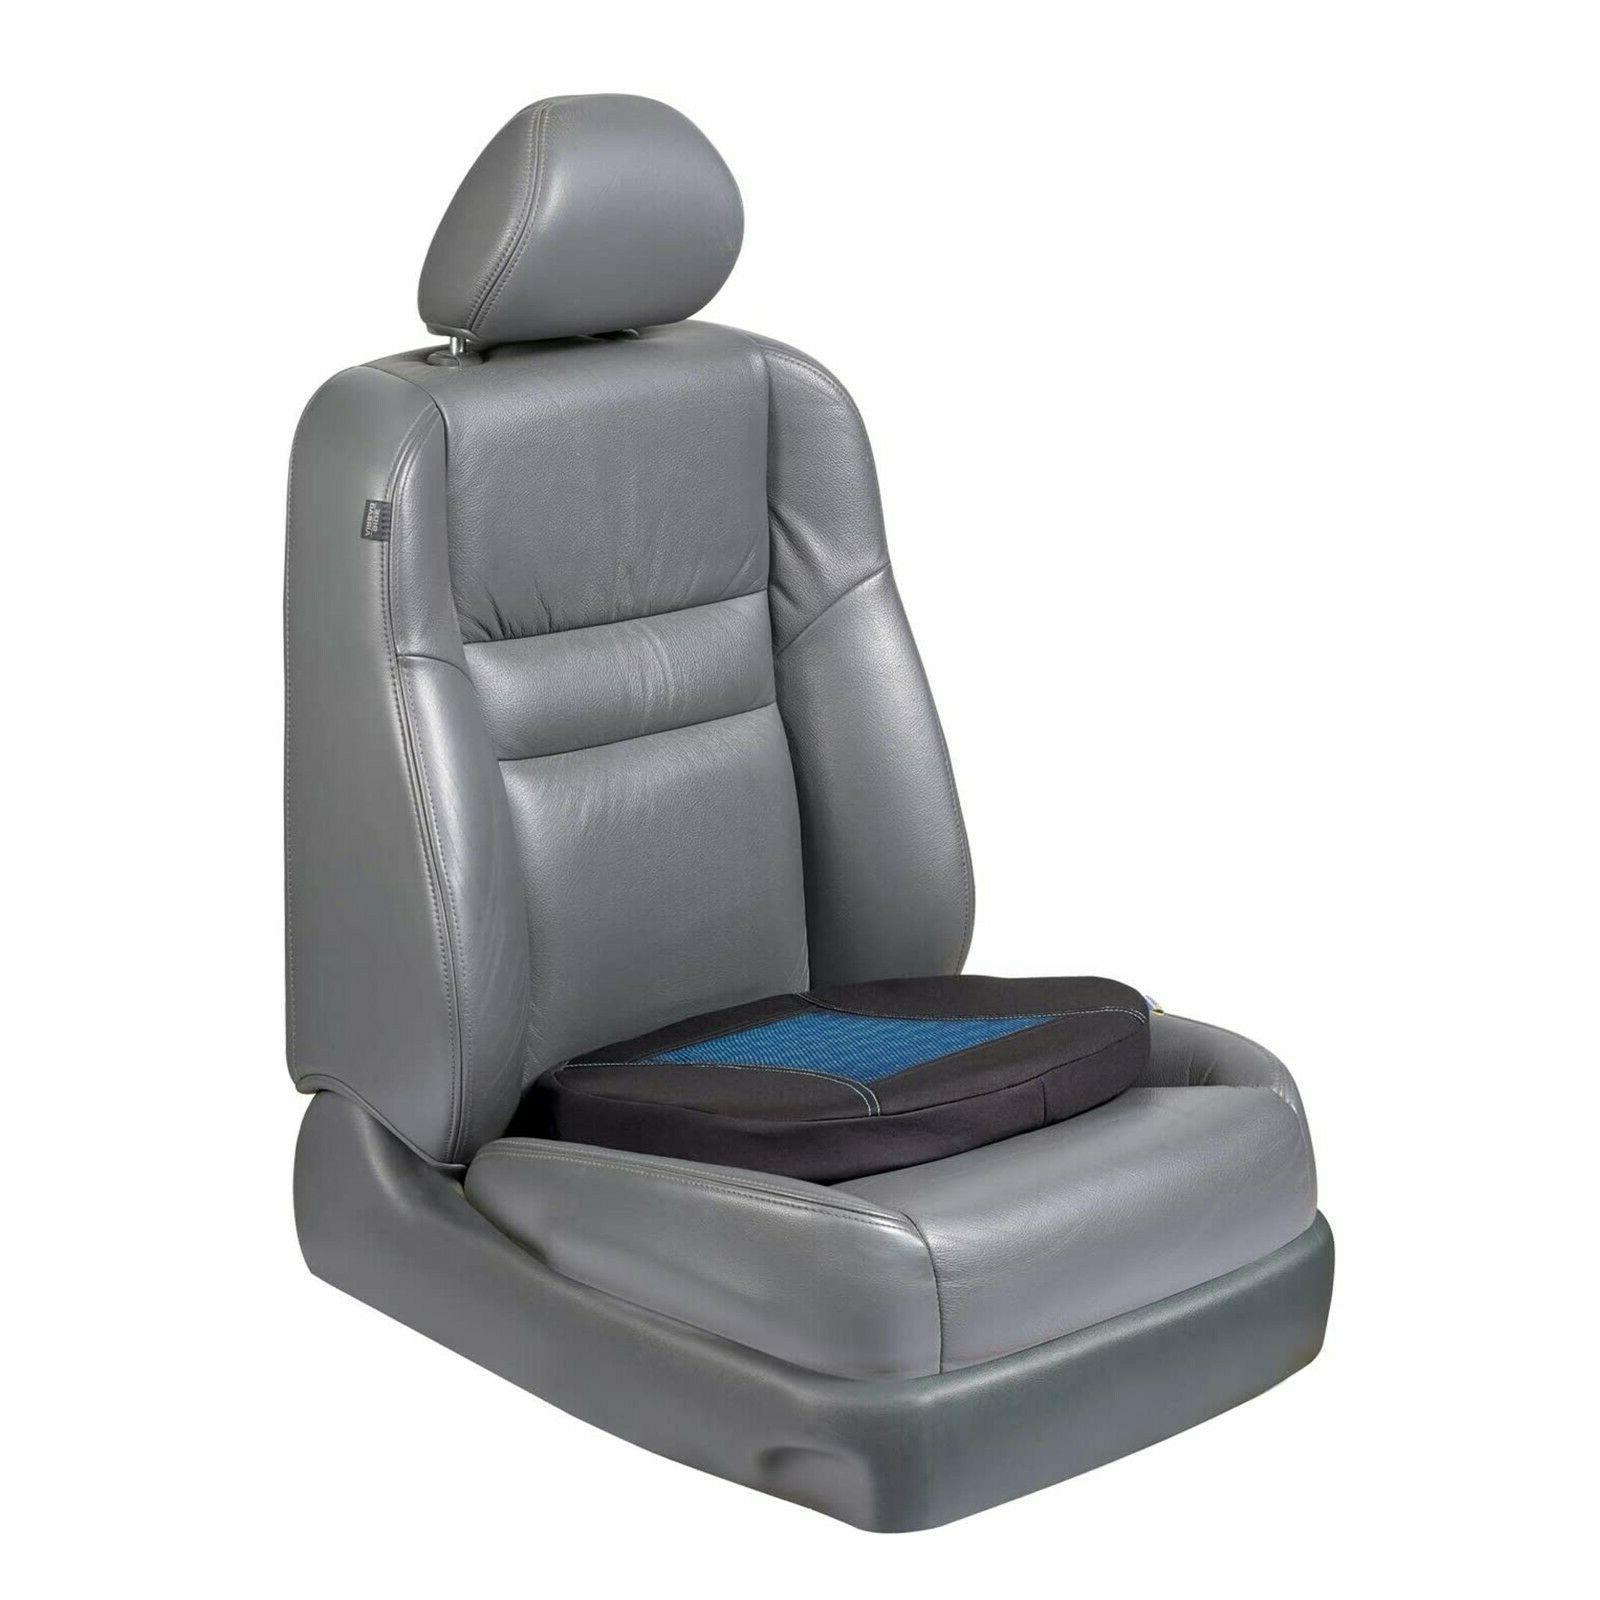 Orthopedic Gel Foam Seat Chair